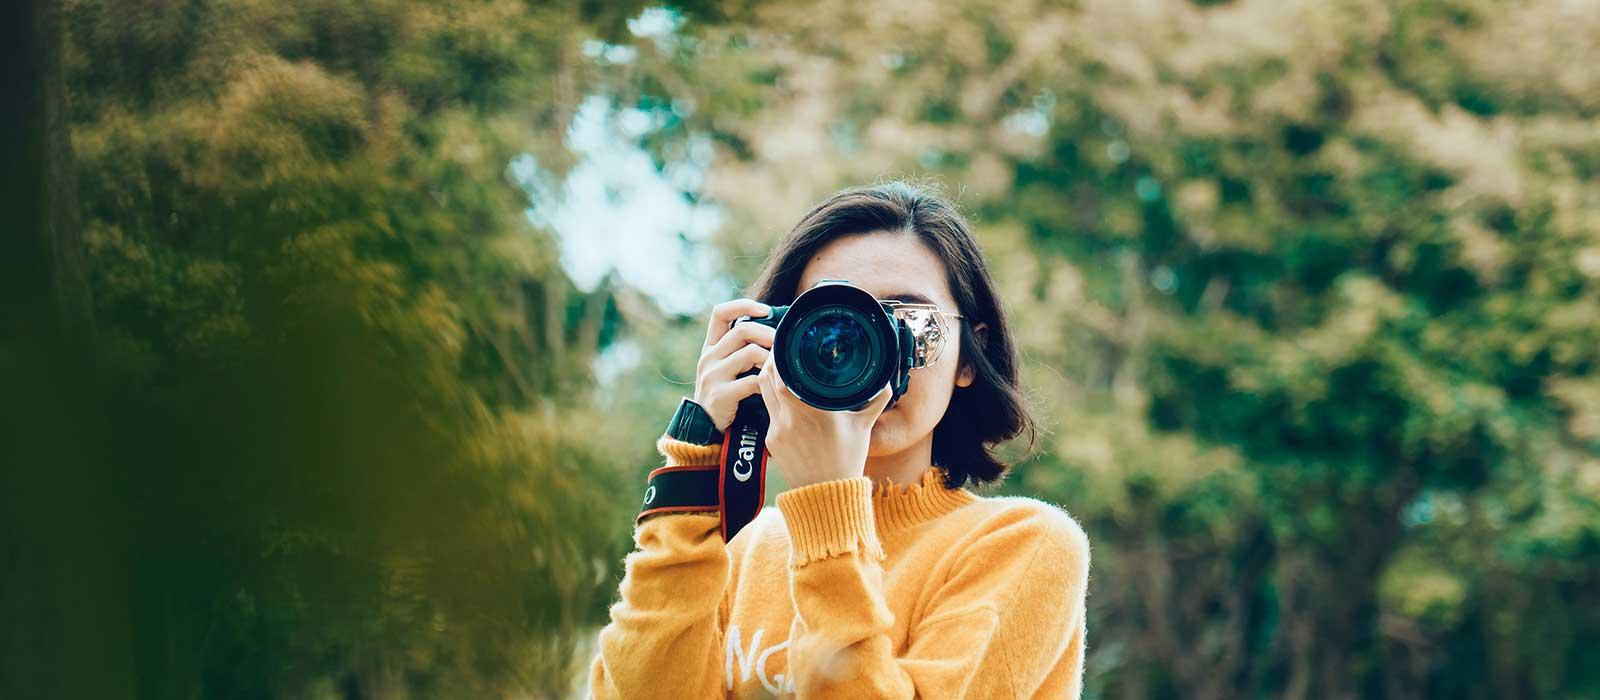 Girl taking photos with digital camera